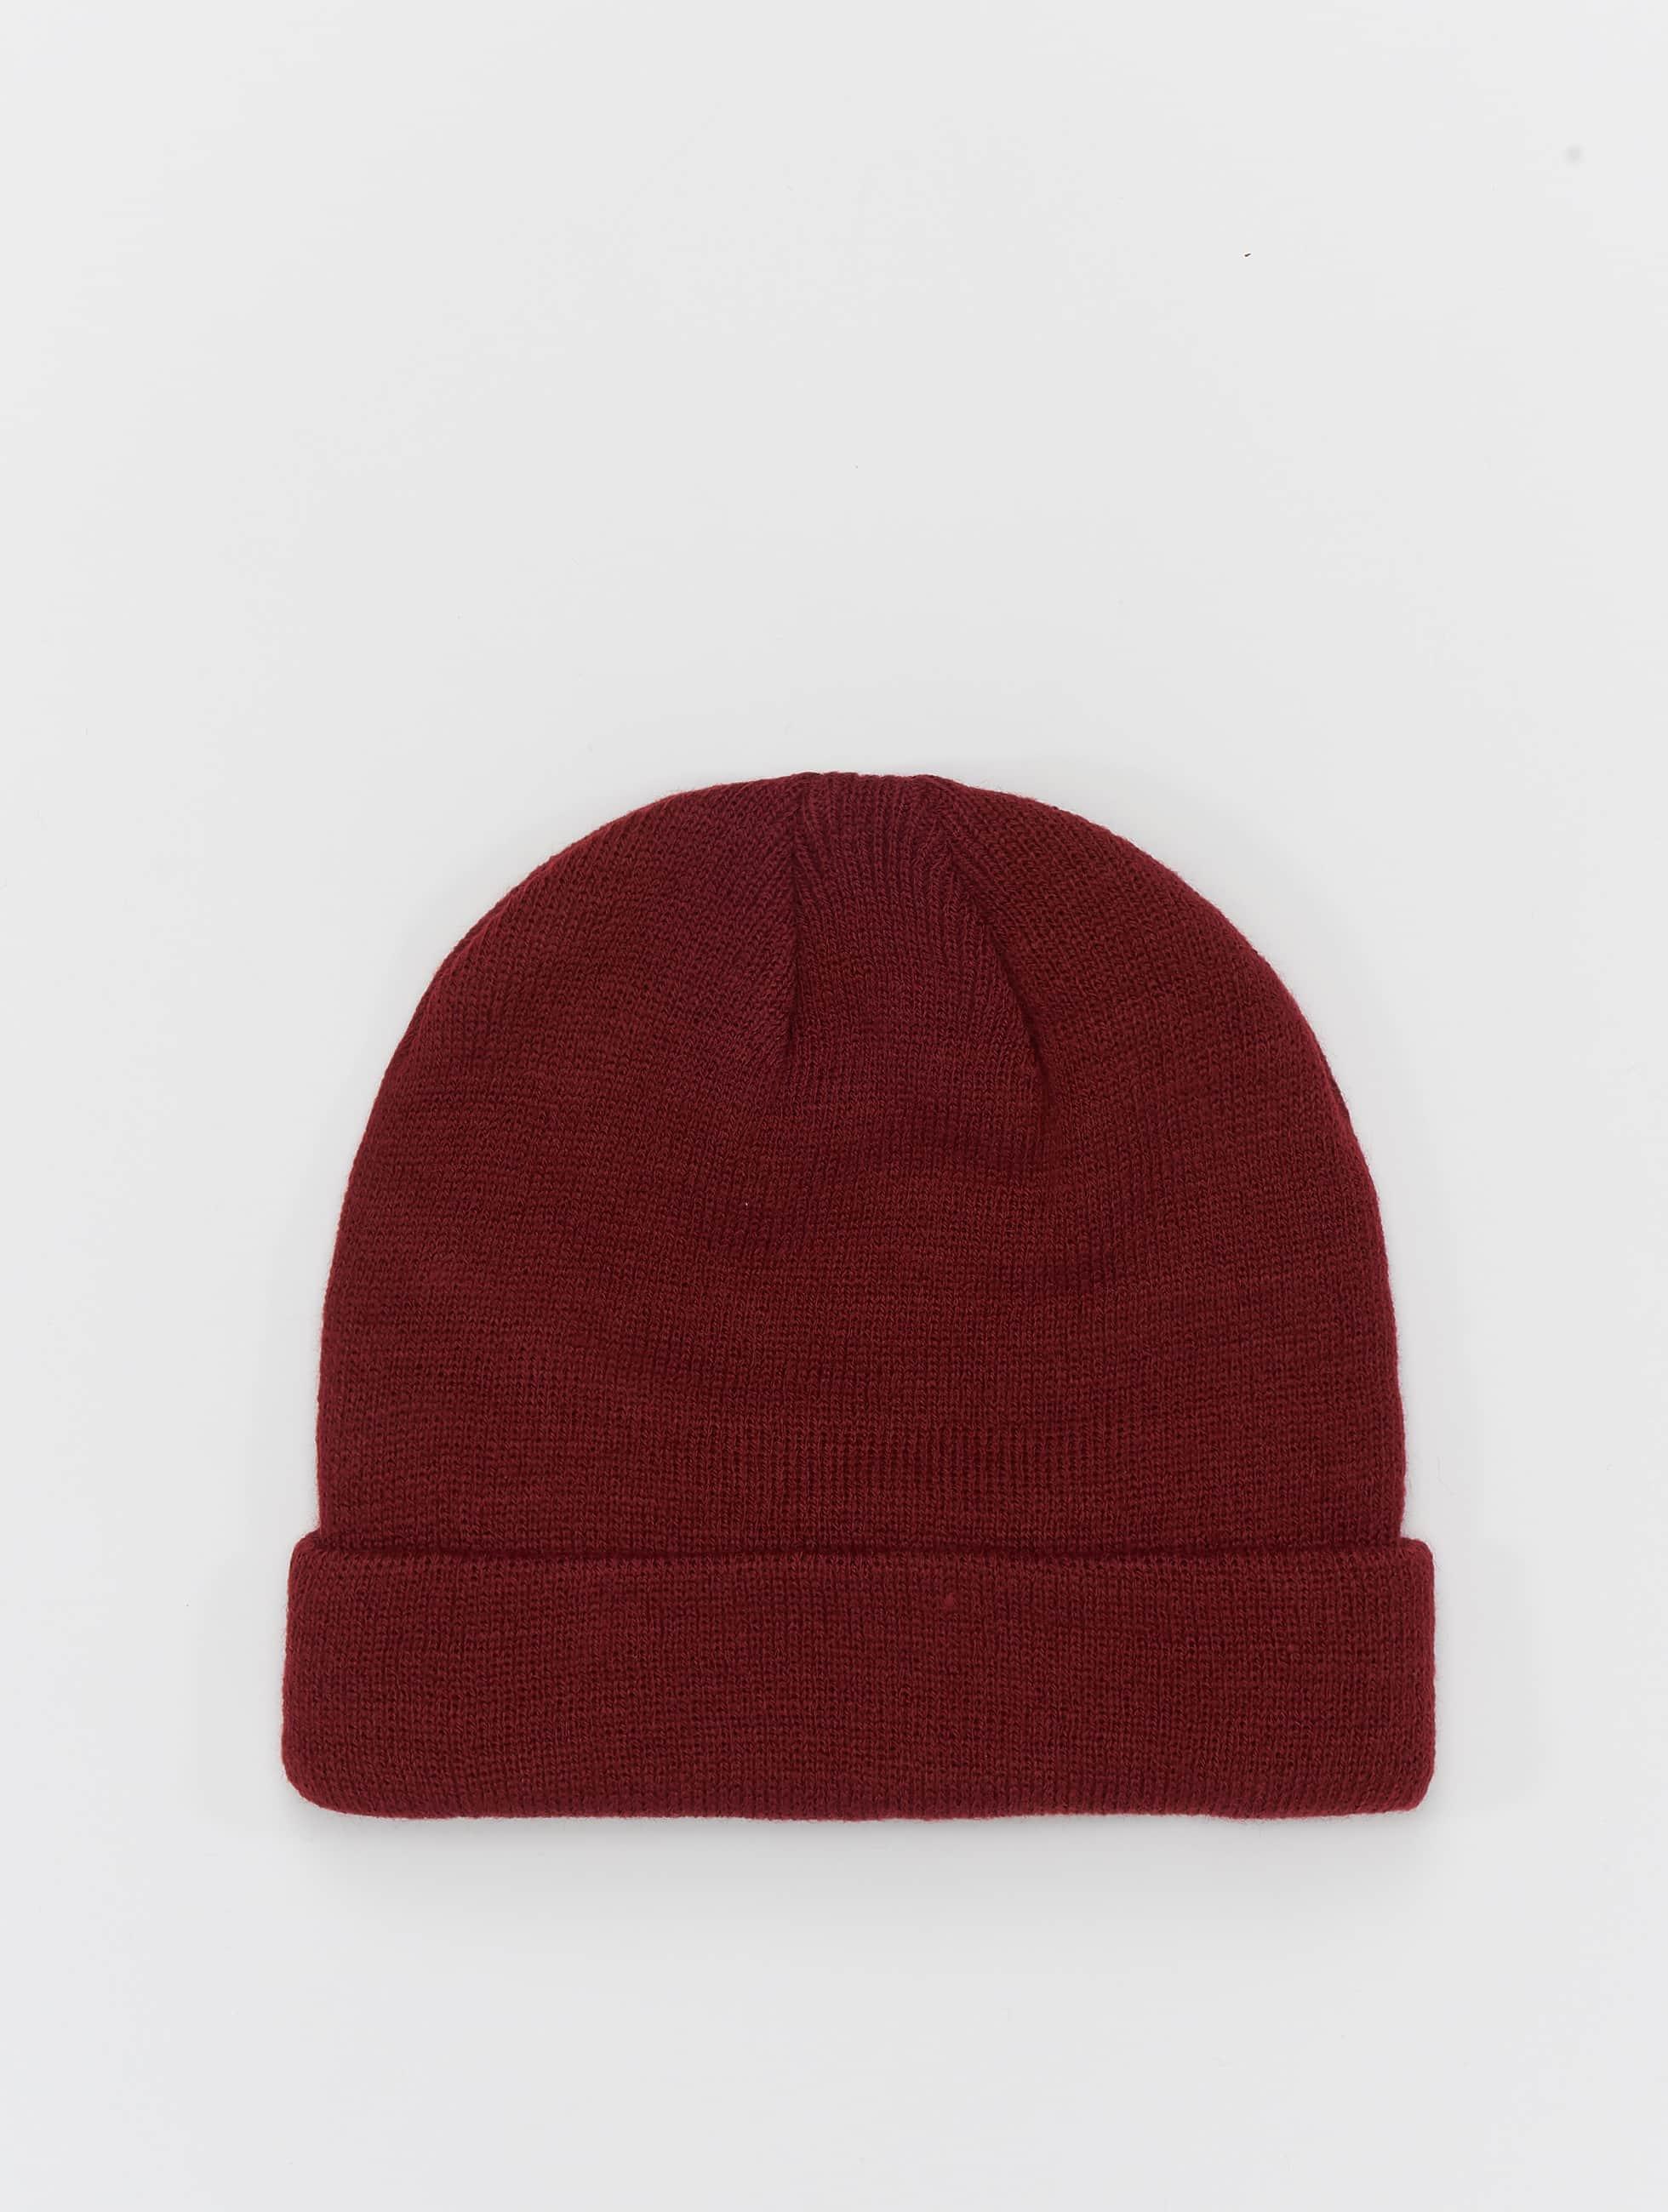 MSTRDS шляпа Short Cuff Knit красный